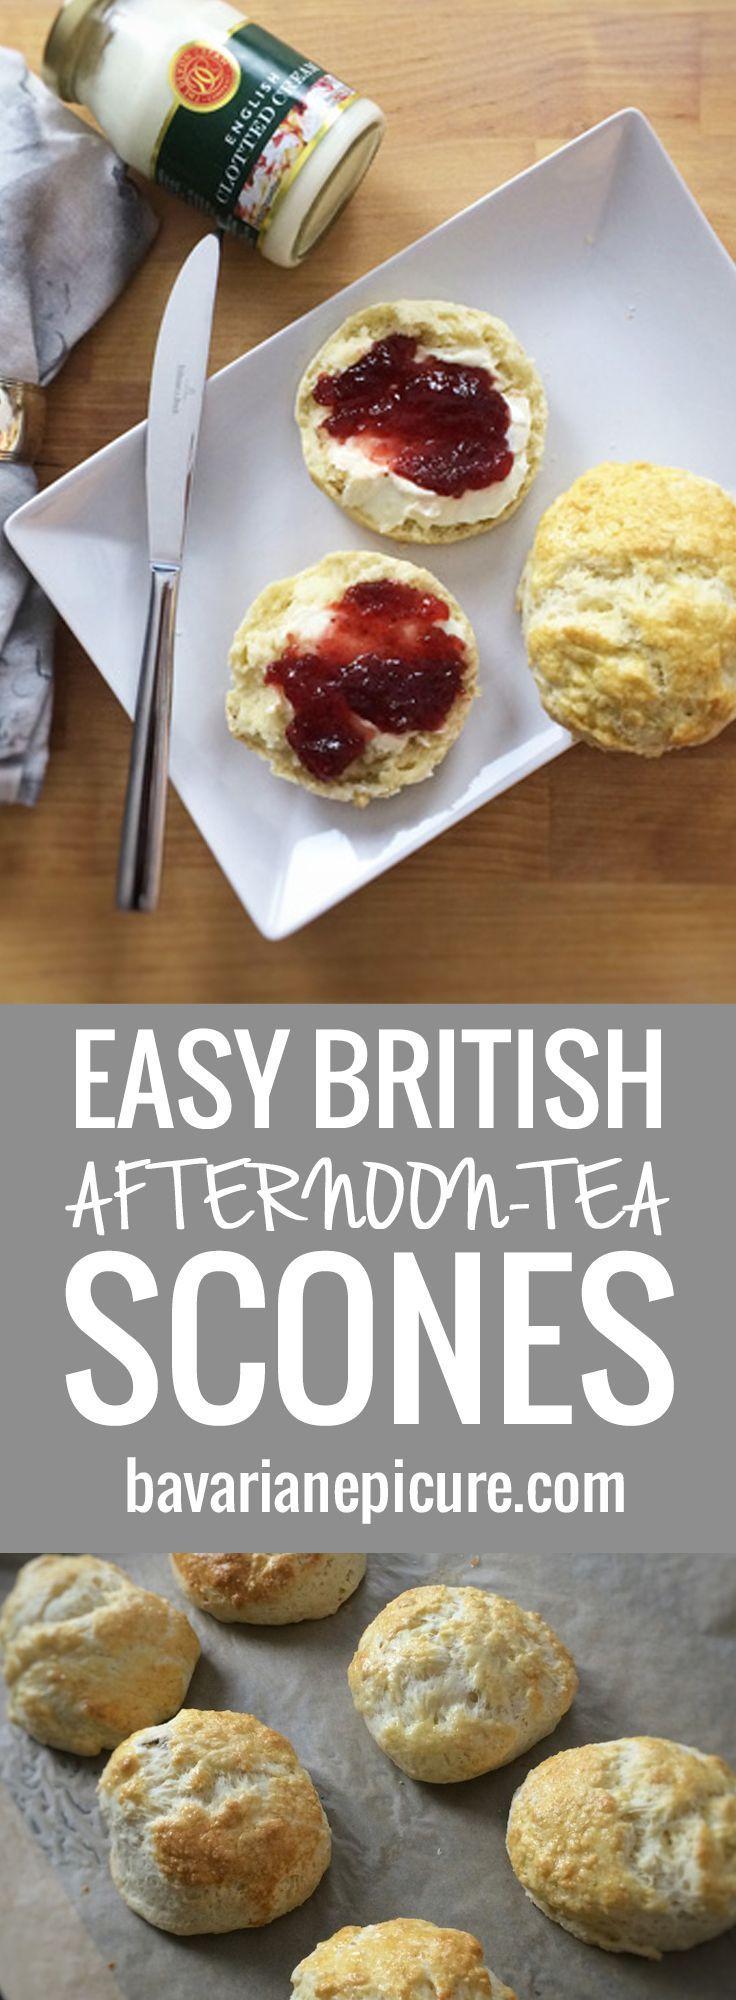 cool Super Easy British Afternoon-Tea Scones | Bavarian Epicureby http://dezdemon99-recipesations.gdn